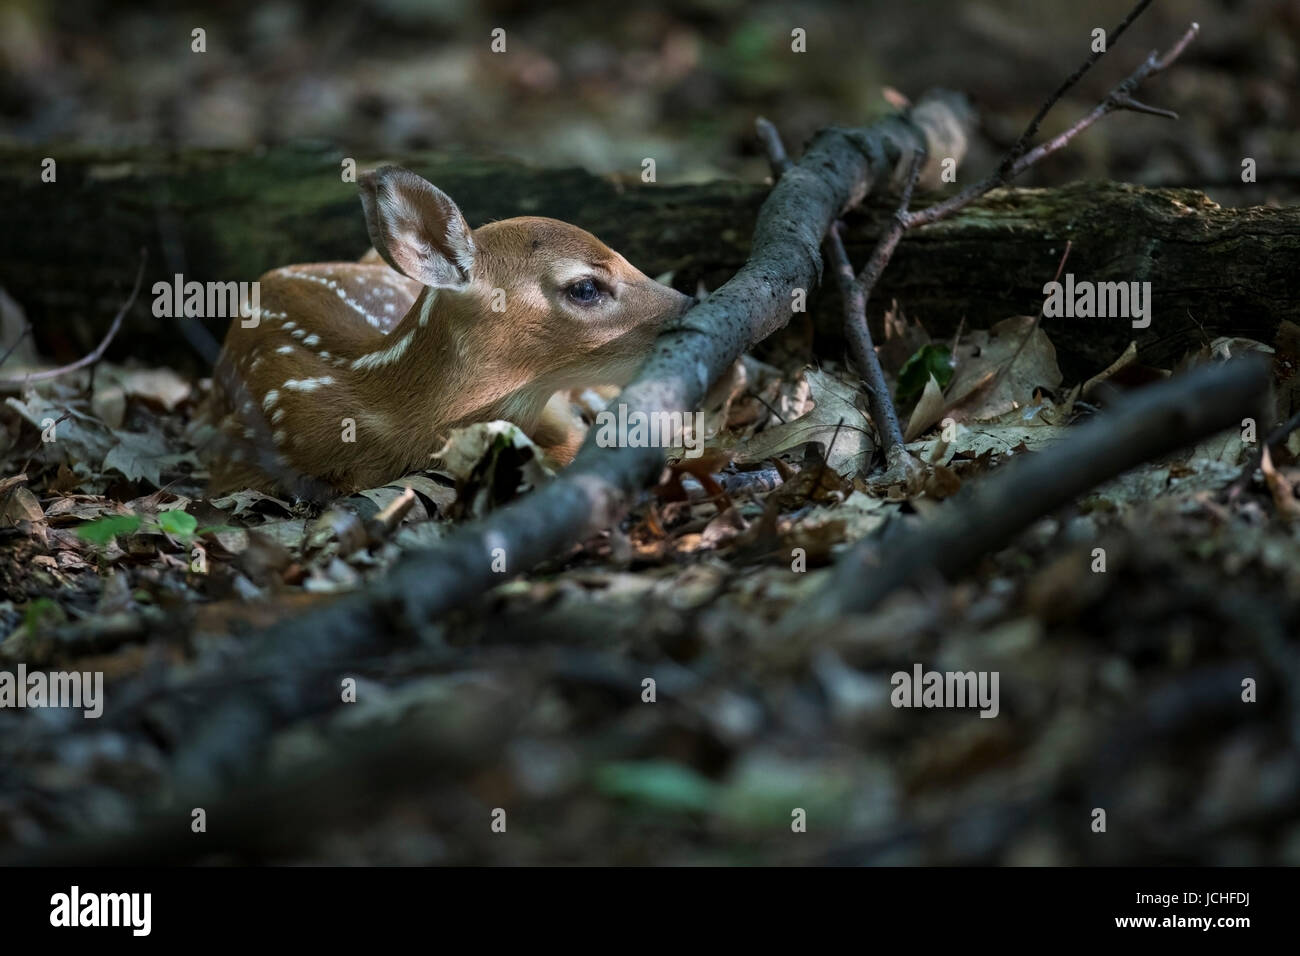 Fawn whitetail deer hidden next to a log. - Stock Image